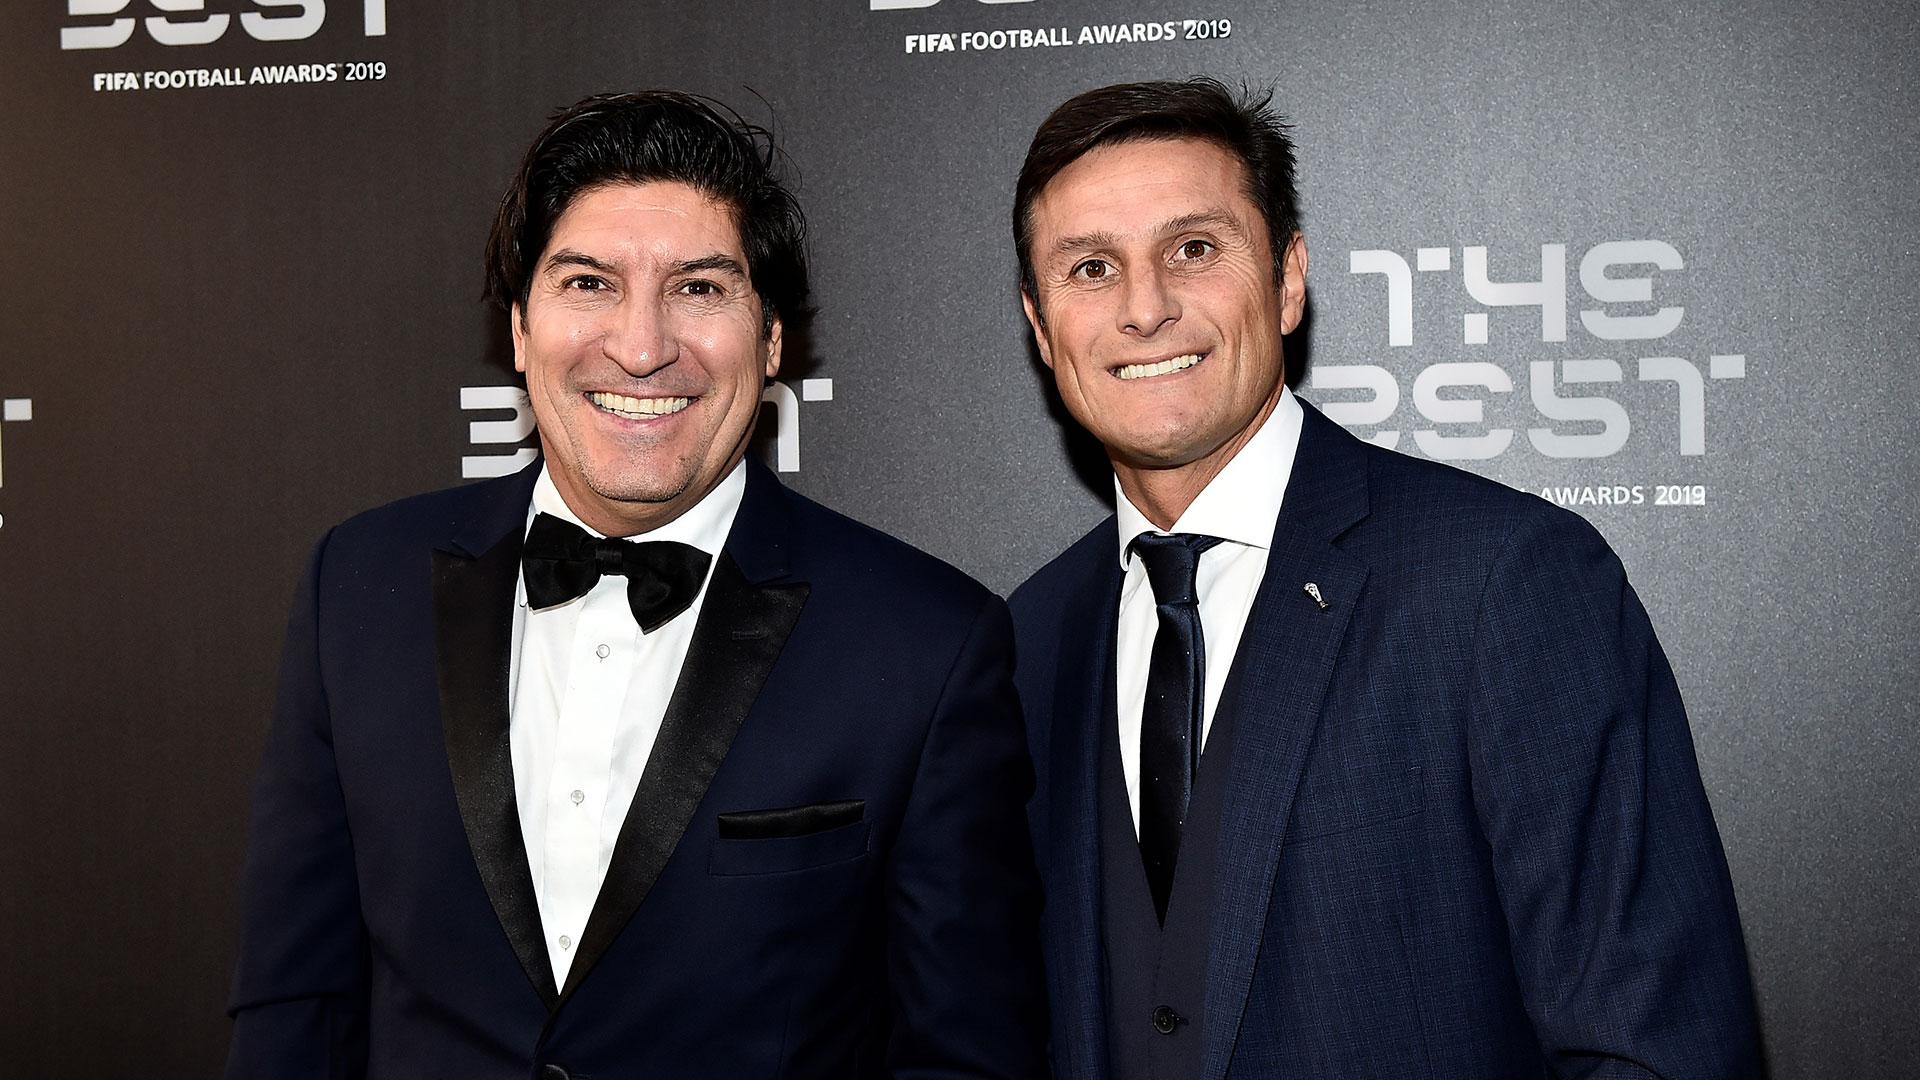 Los ex futbolistas Iván Zamorano y Javier Zanetti